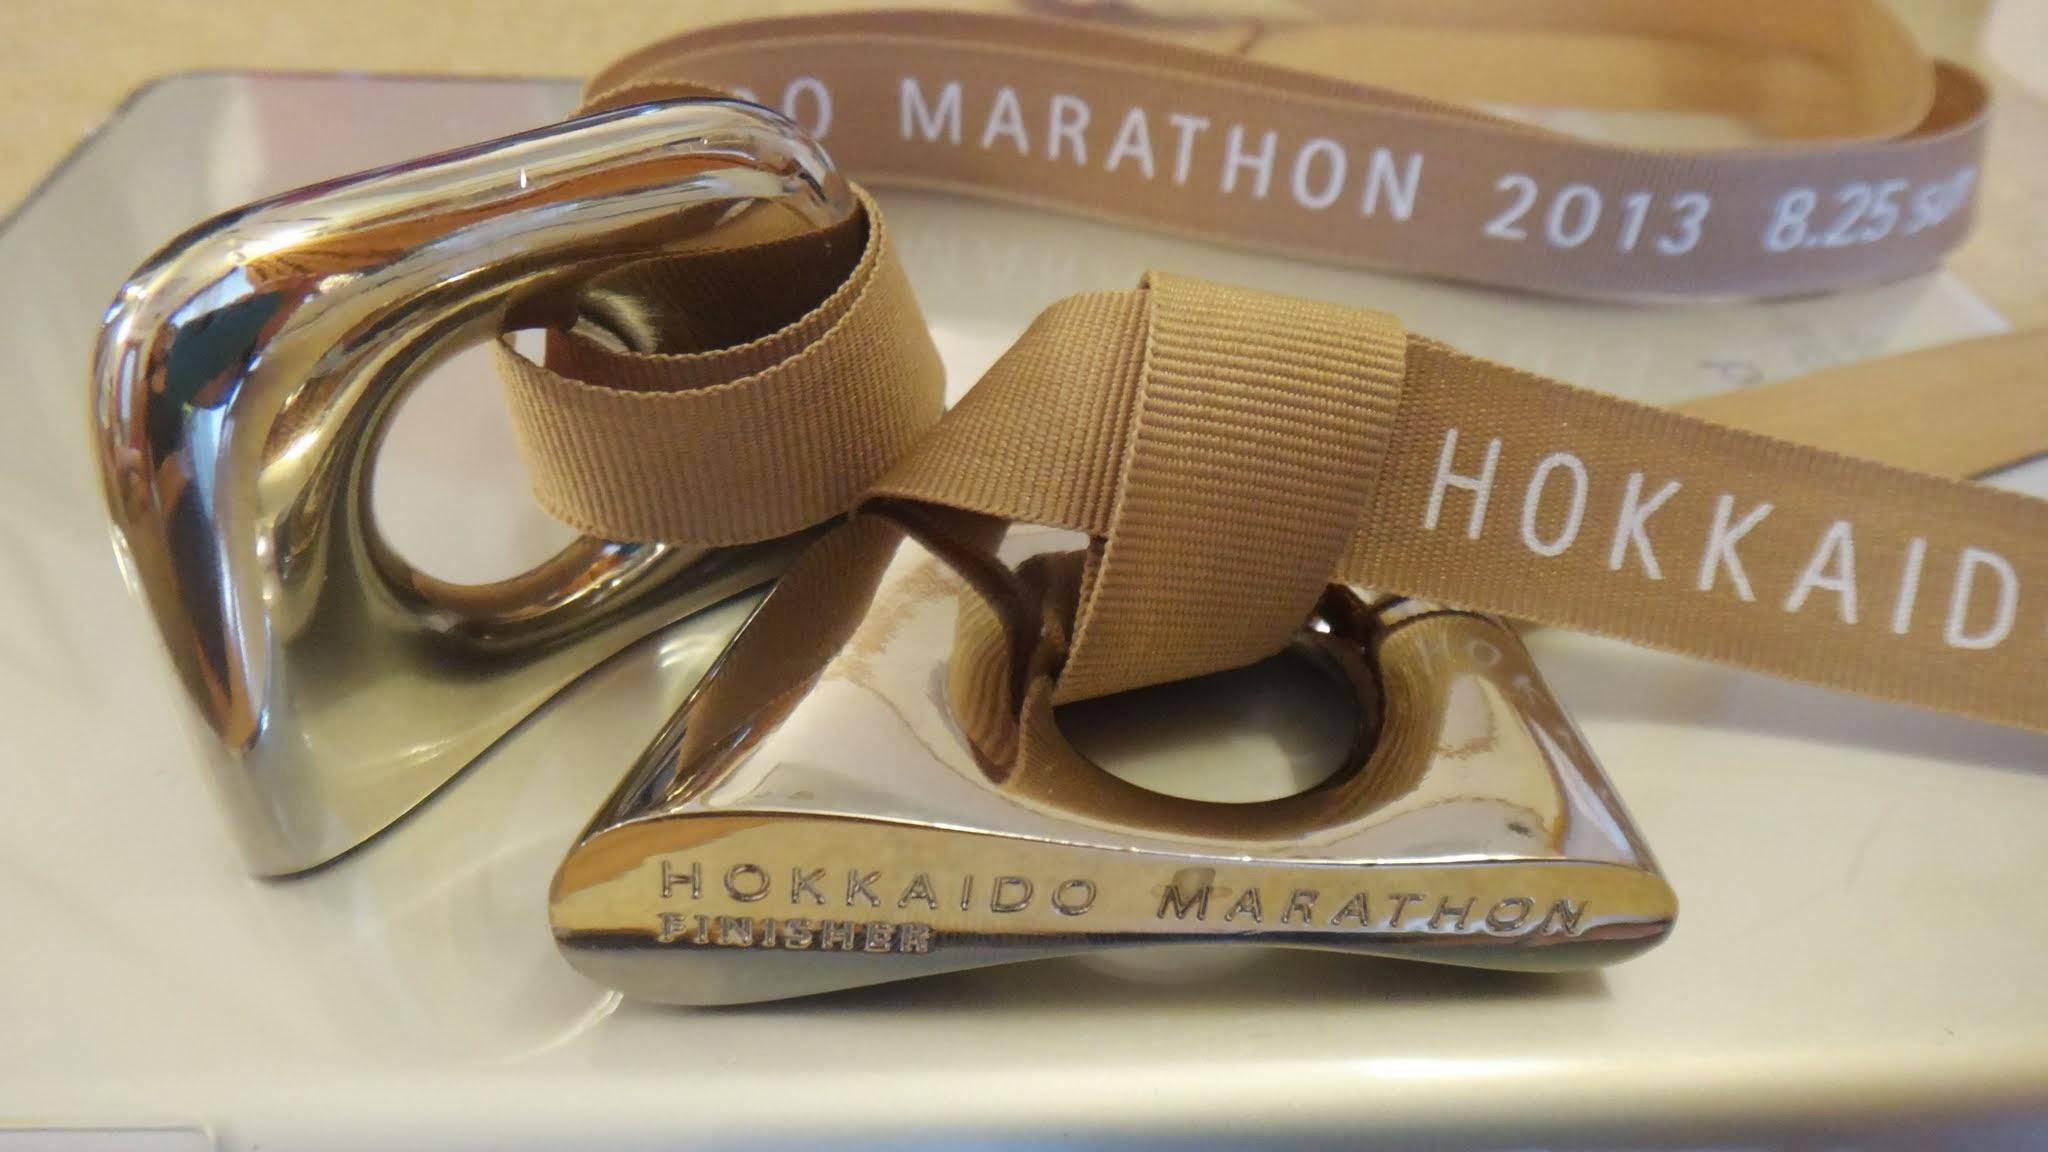 Hokkaido Medal